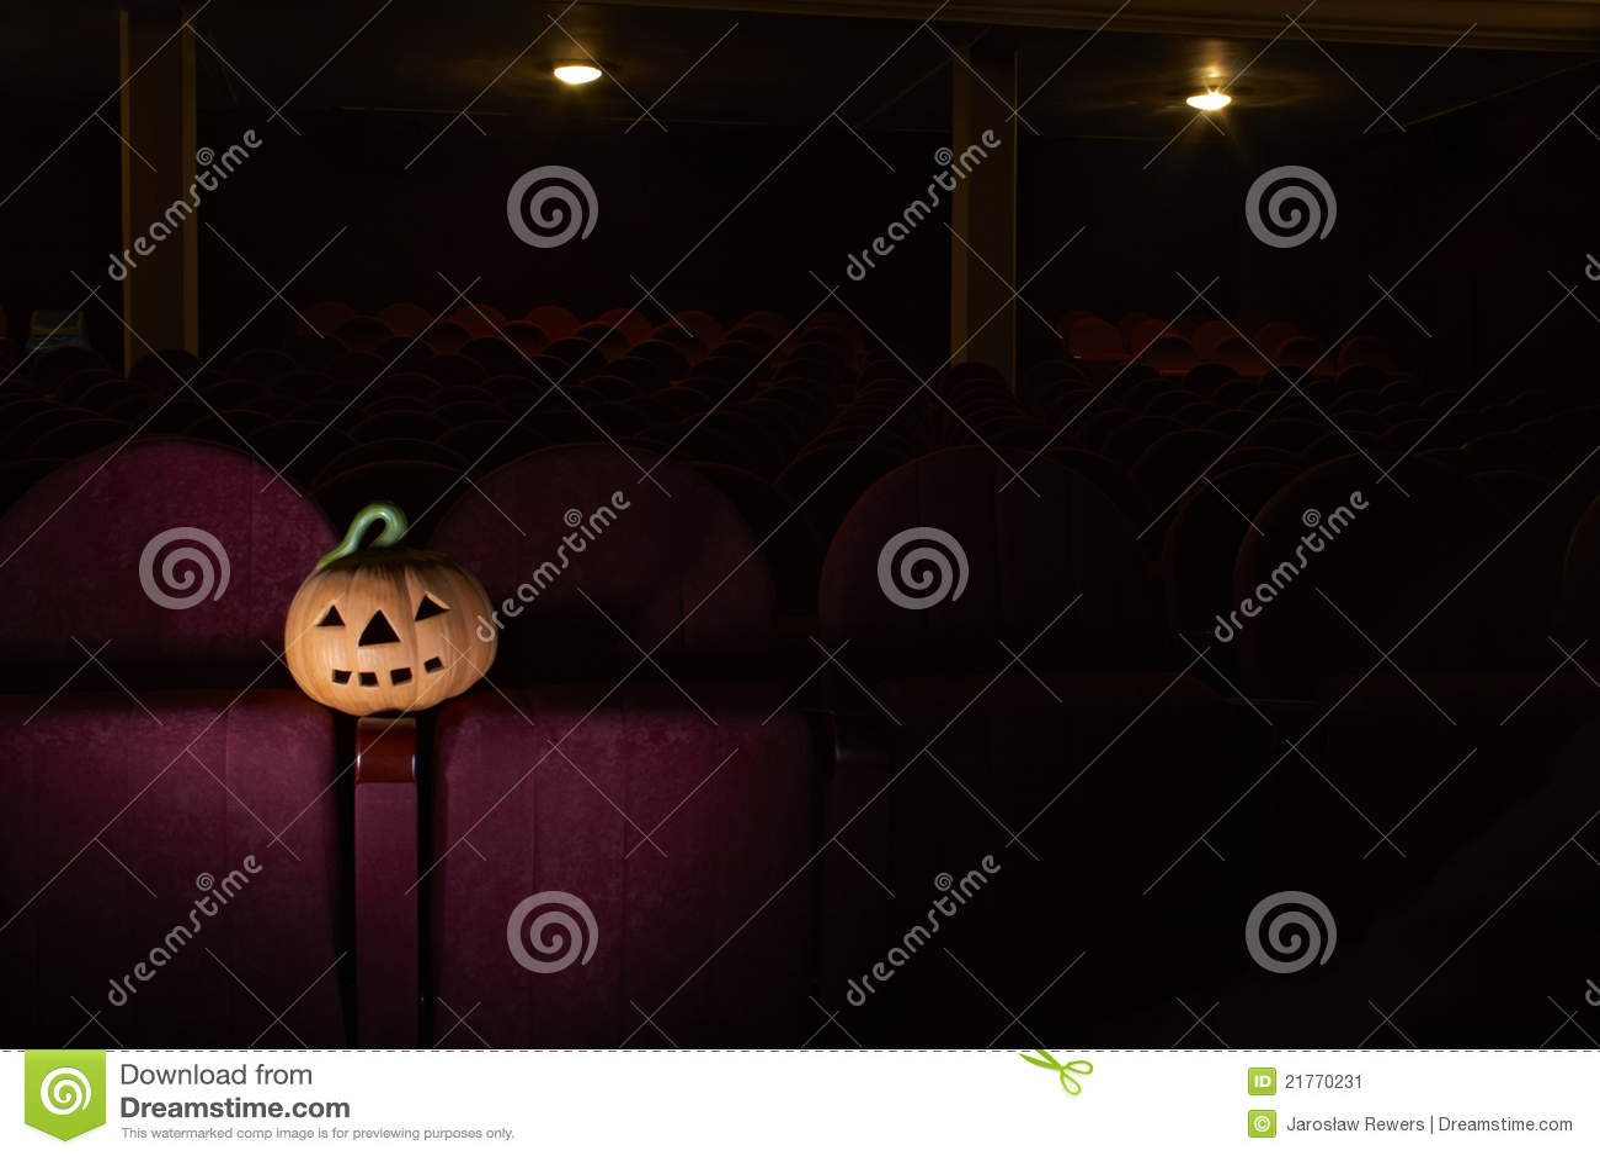 кино halloween